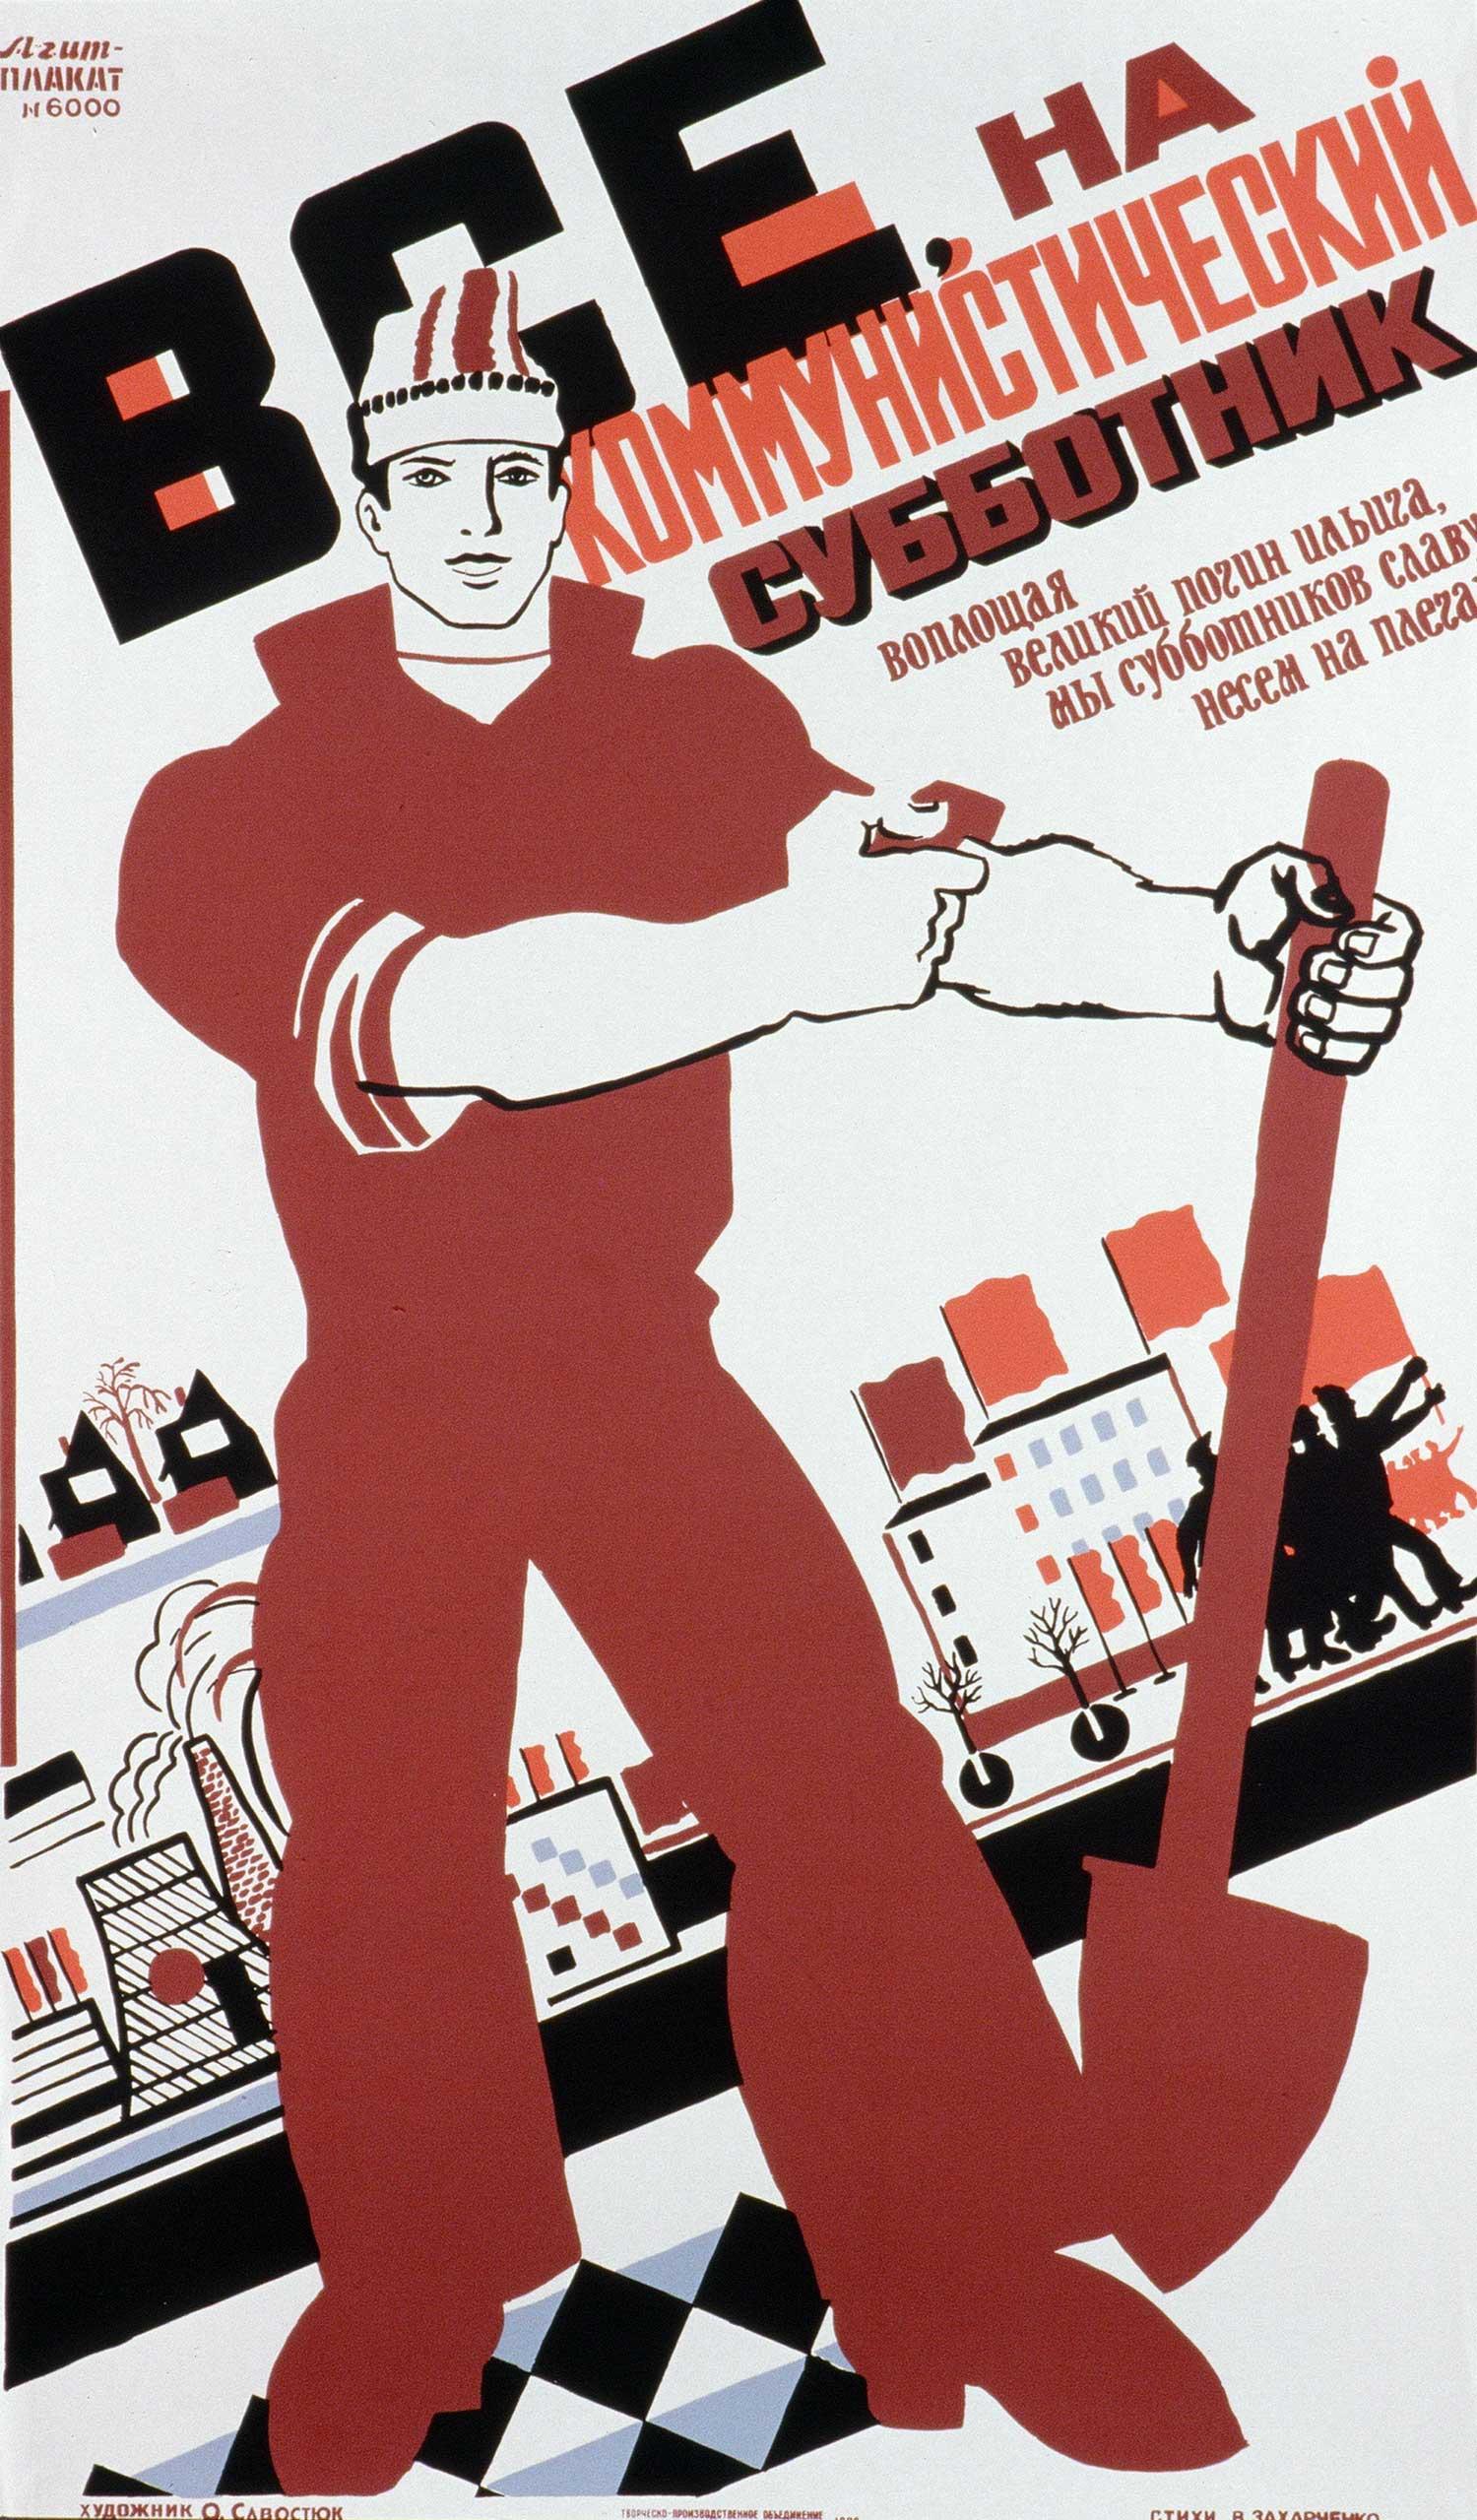 ron-miriello-grafico-soviet-posters-aiga-san-diego-community-design-Miriello-branding-officina-15jpg